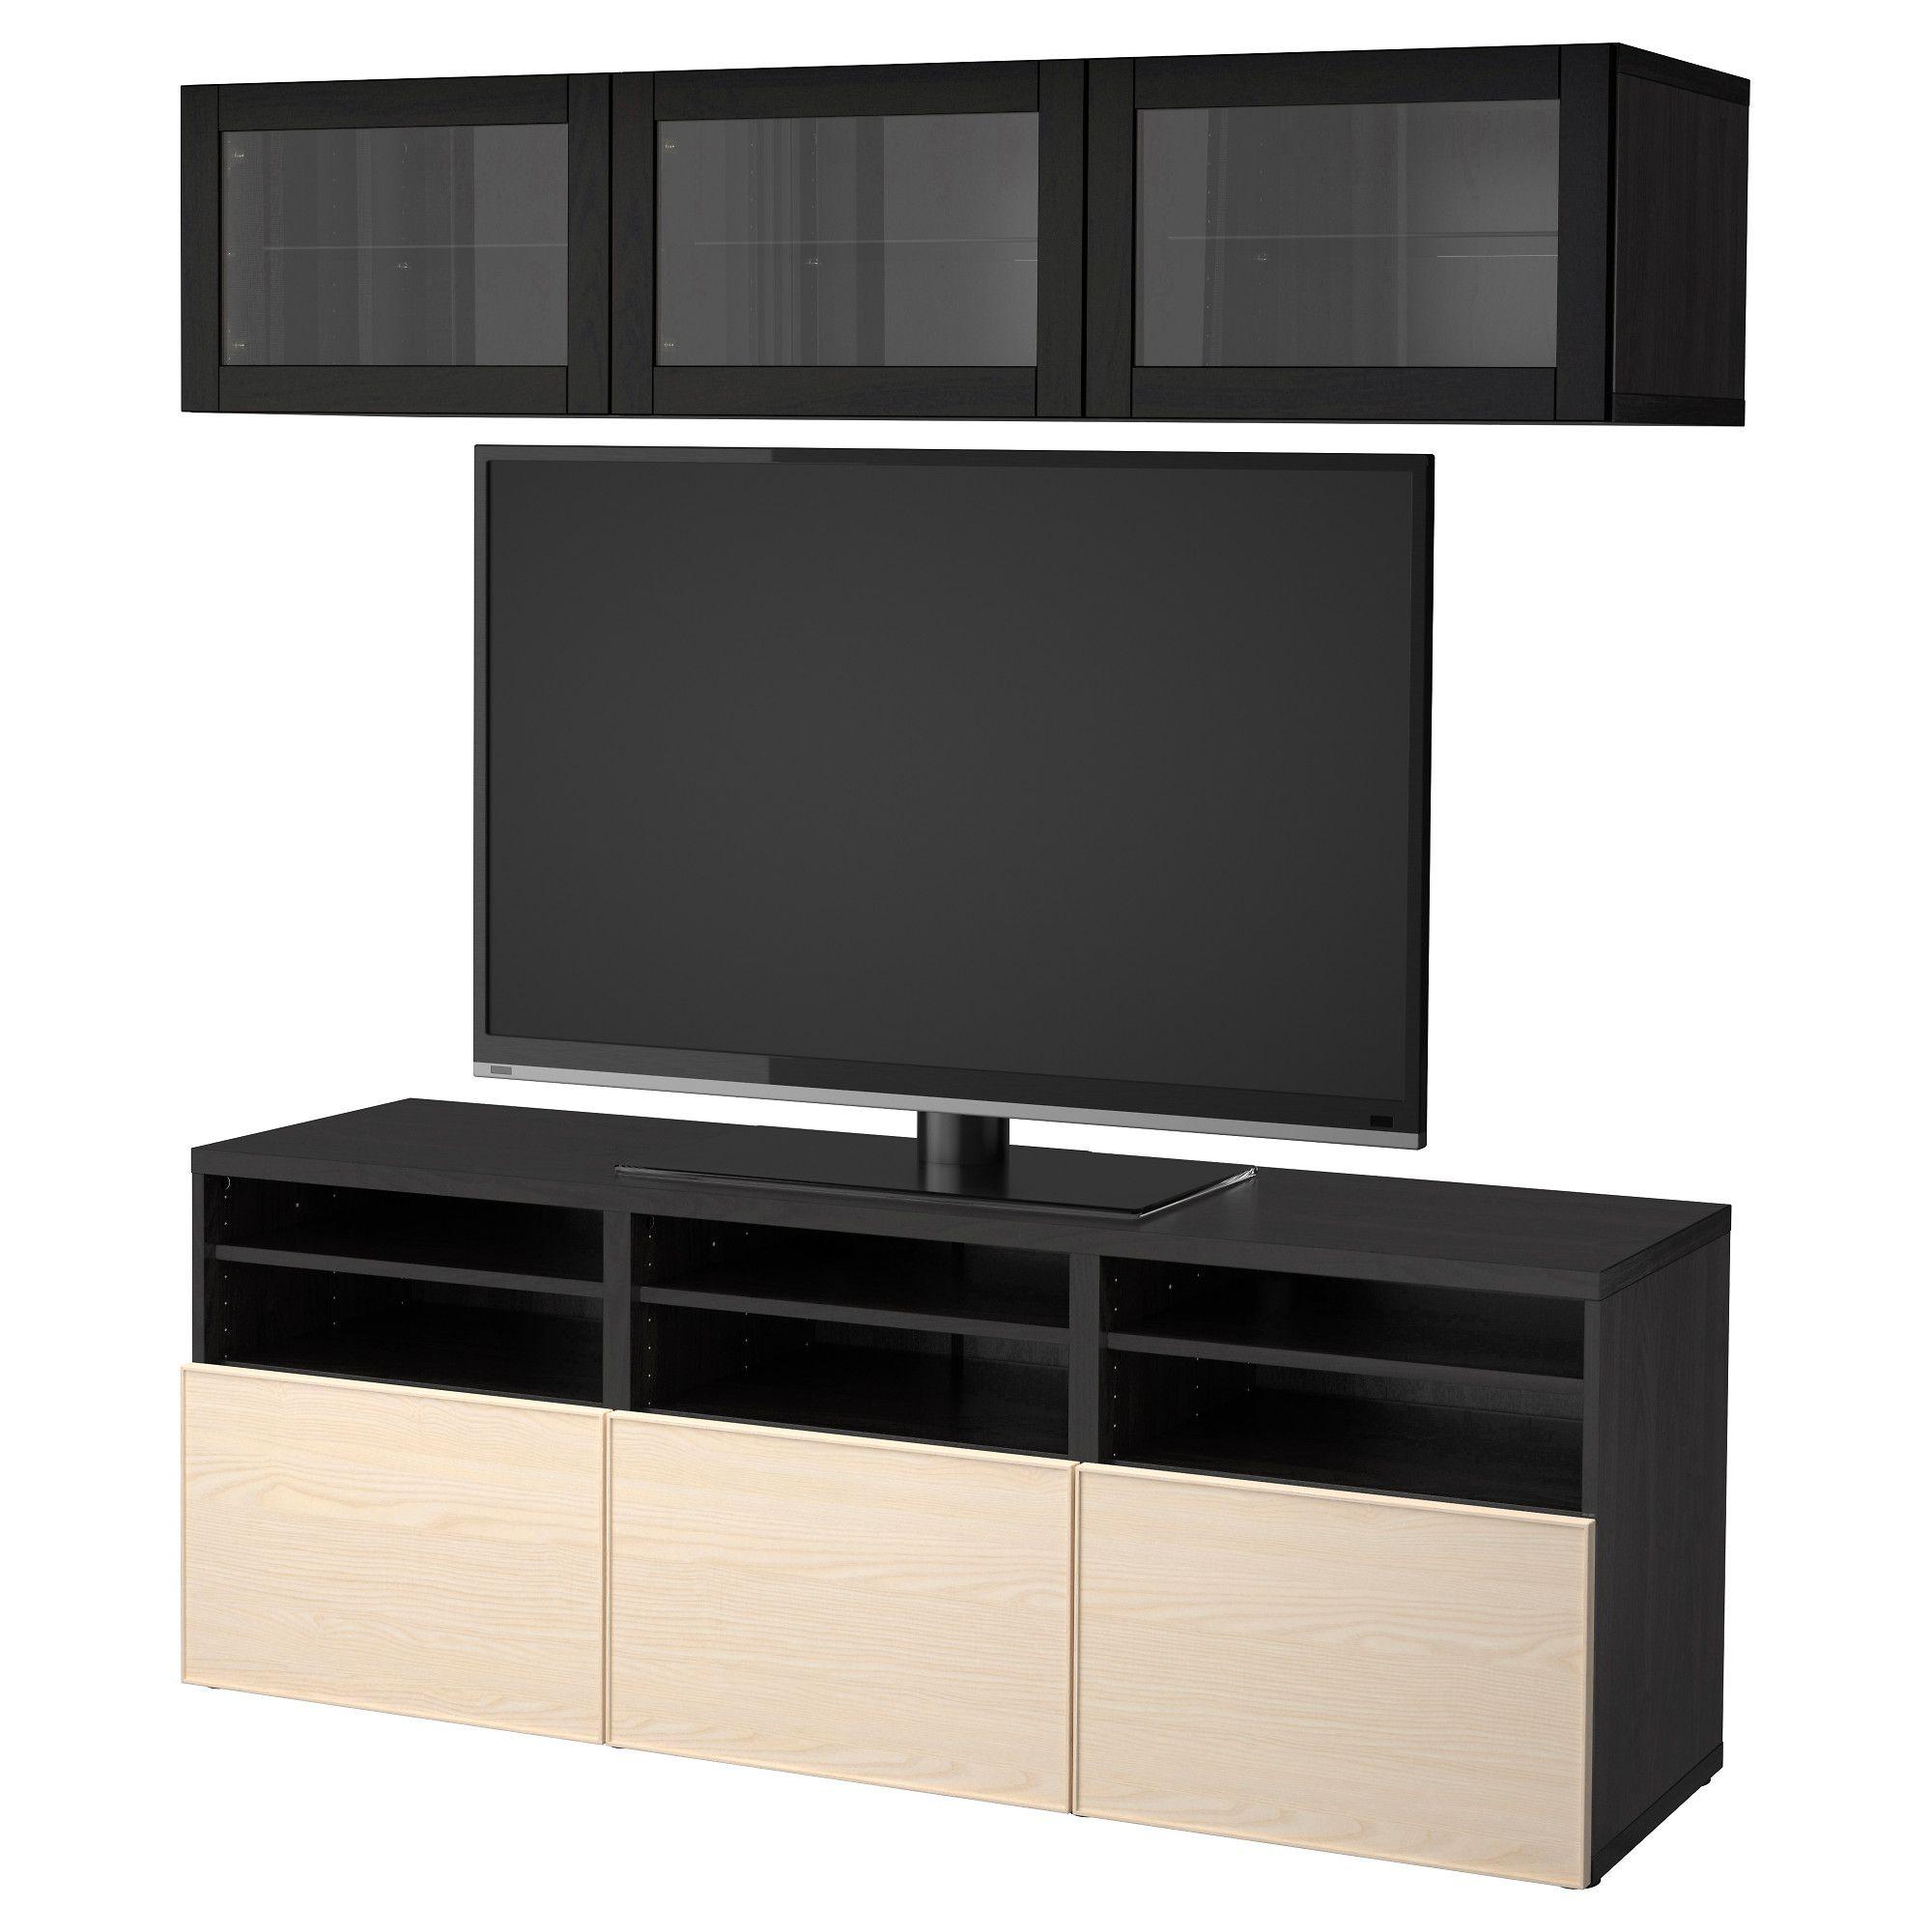 Ikea Besta Tv Storage Combination Glass Doors Black Brown Sindvik Living Storage Ikea Living Furniture